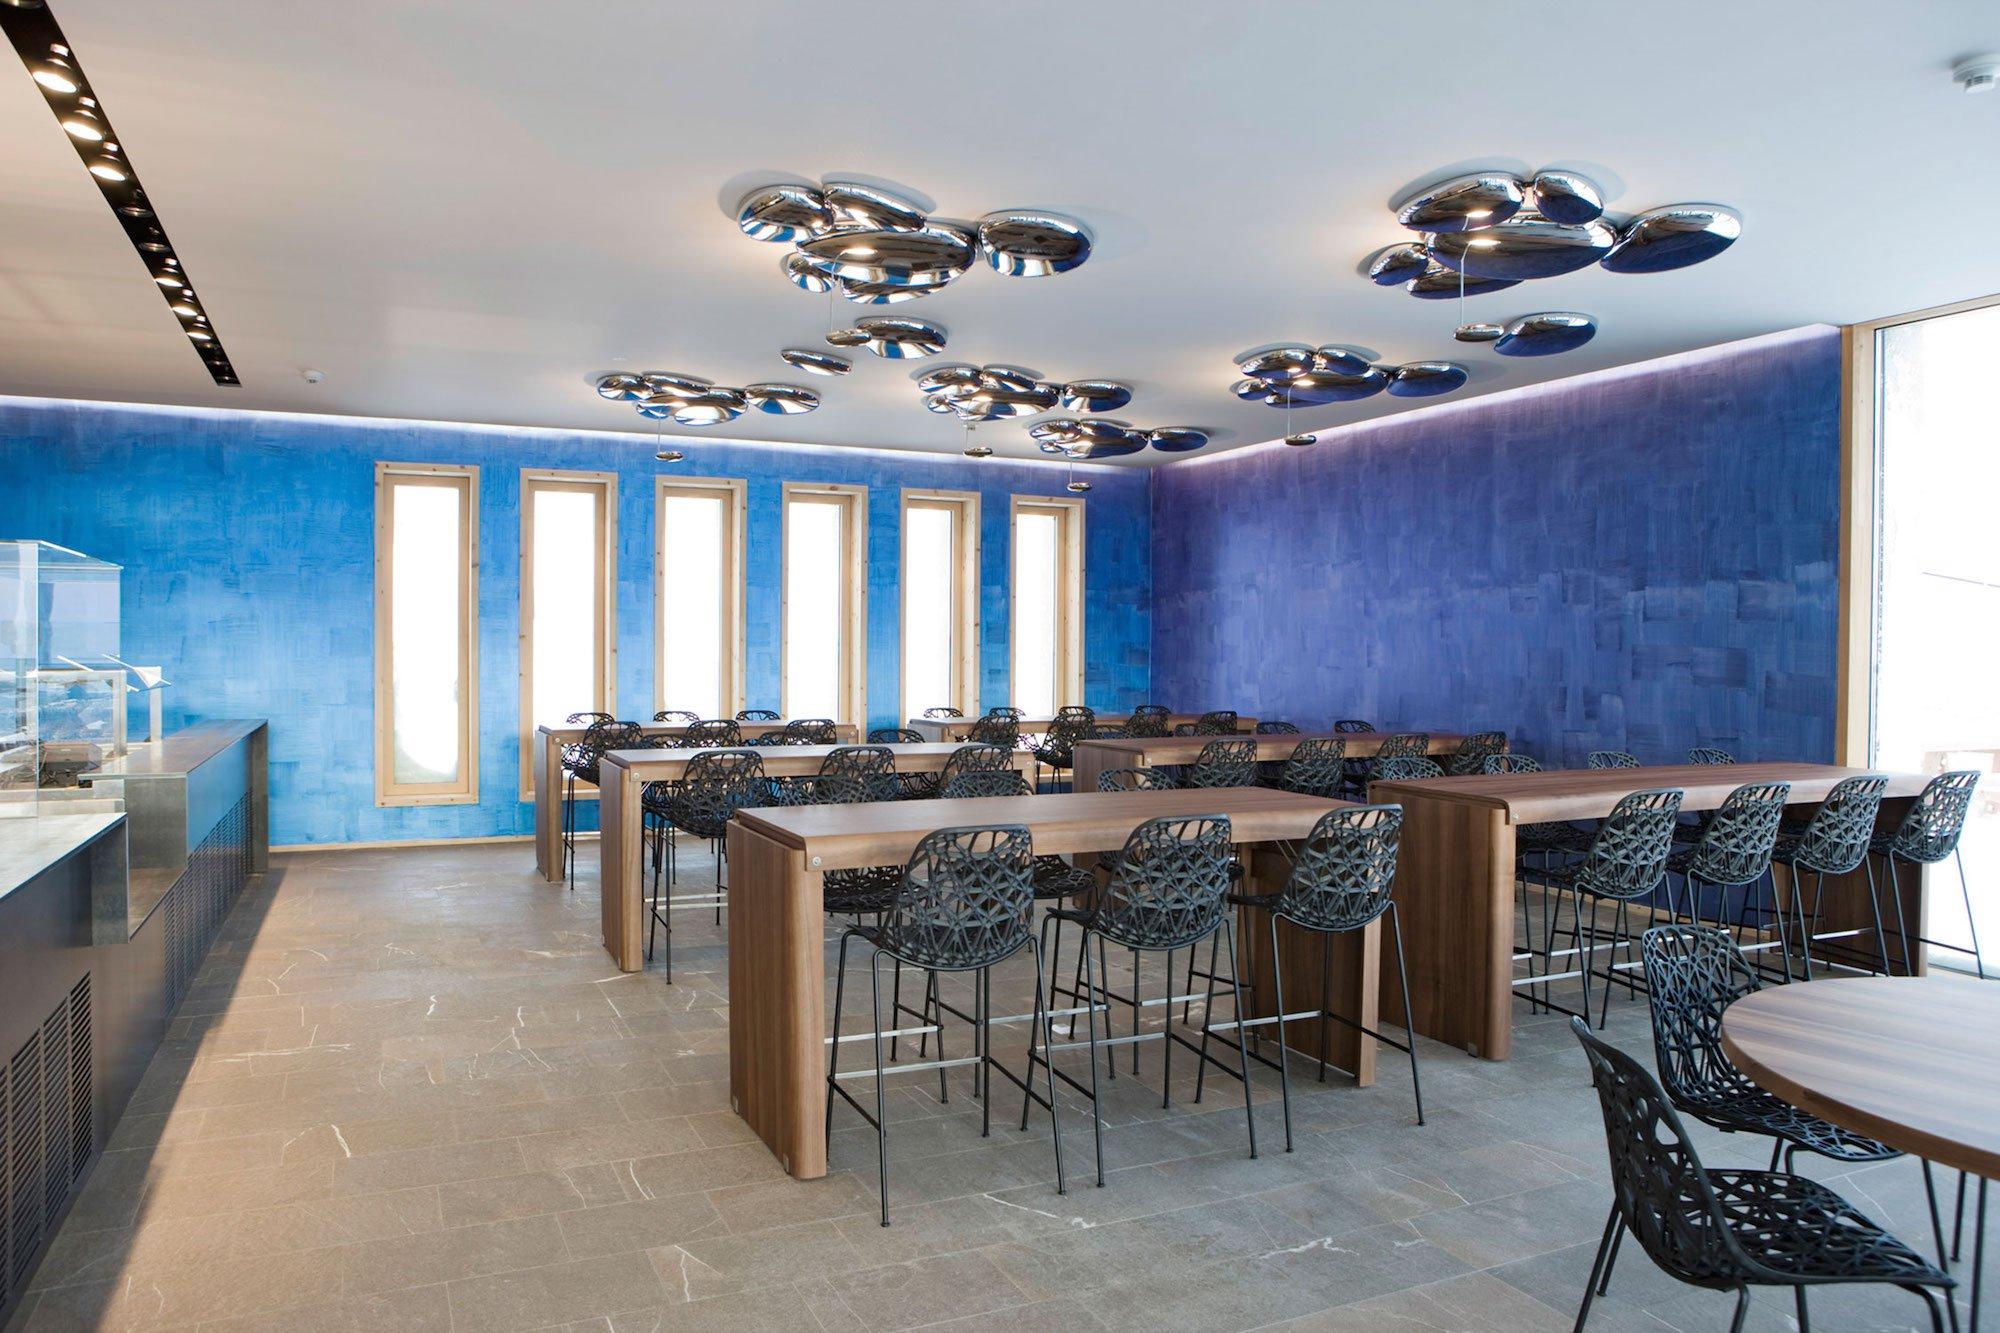 Romantik hotel muottas muragl by franzun ag caandesign for Berghotel design